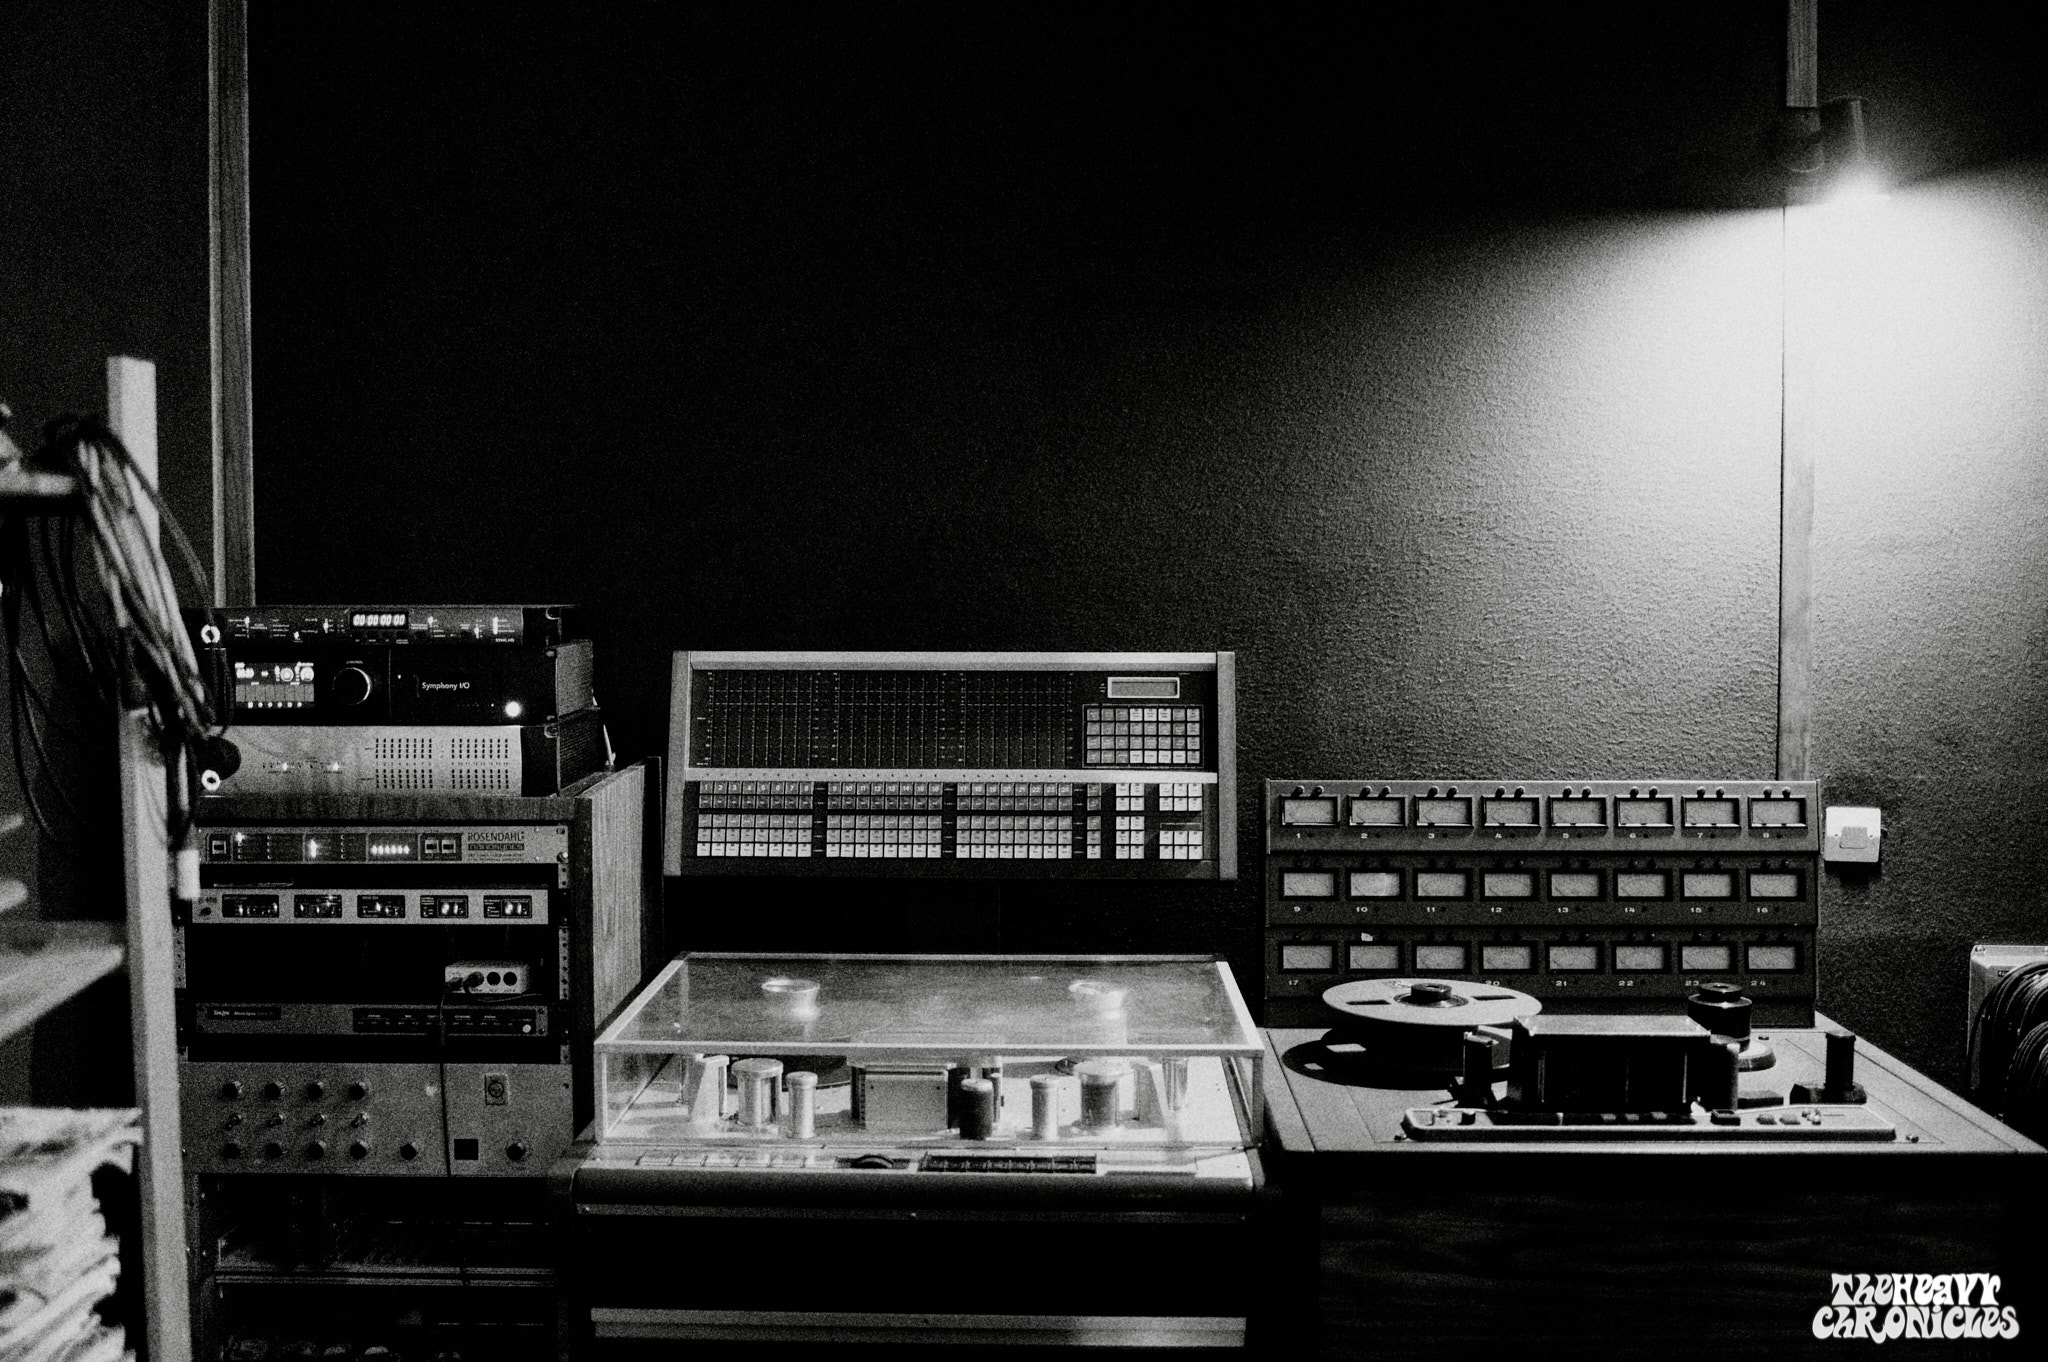 Elder-Studio-Black-Box-2019-Gael-Mathieu-The-Heavy-Chronicles-52